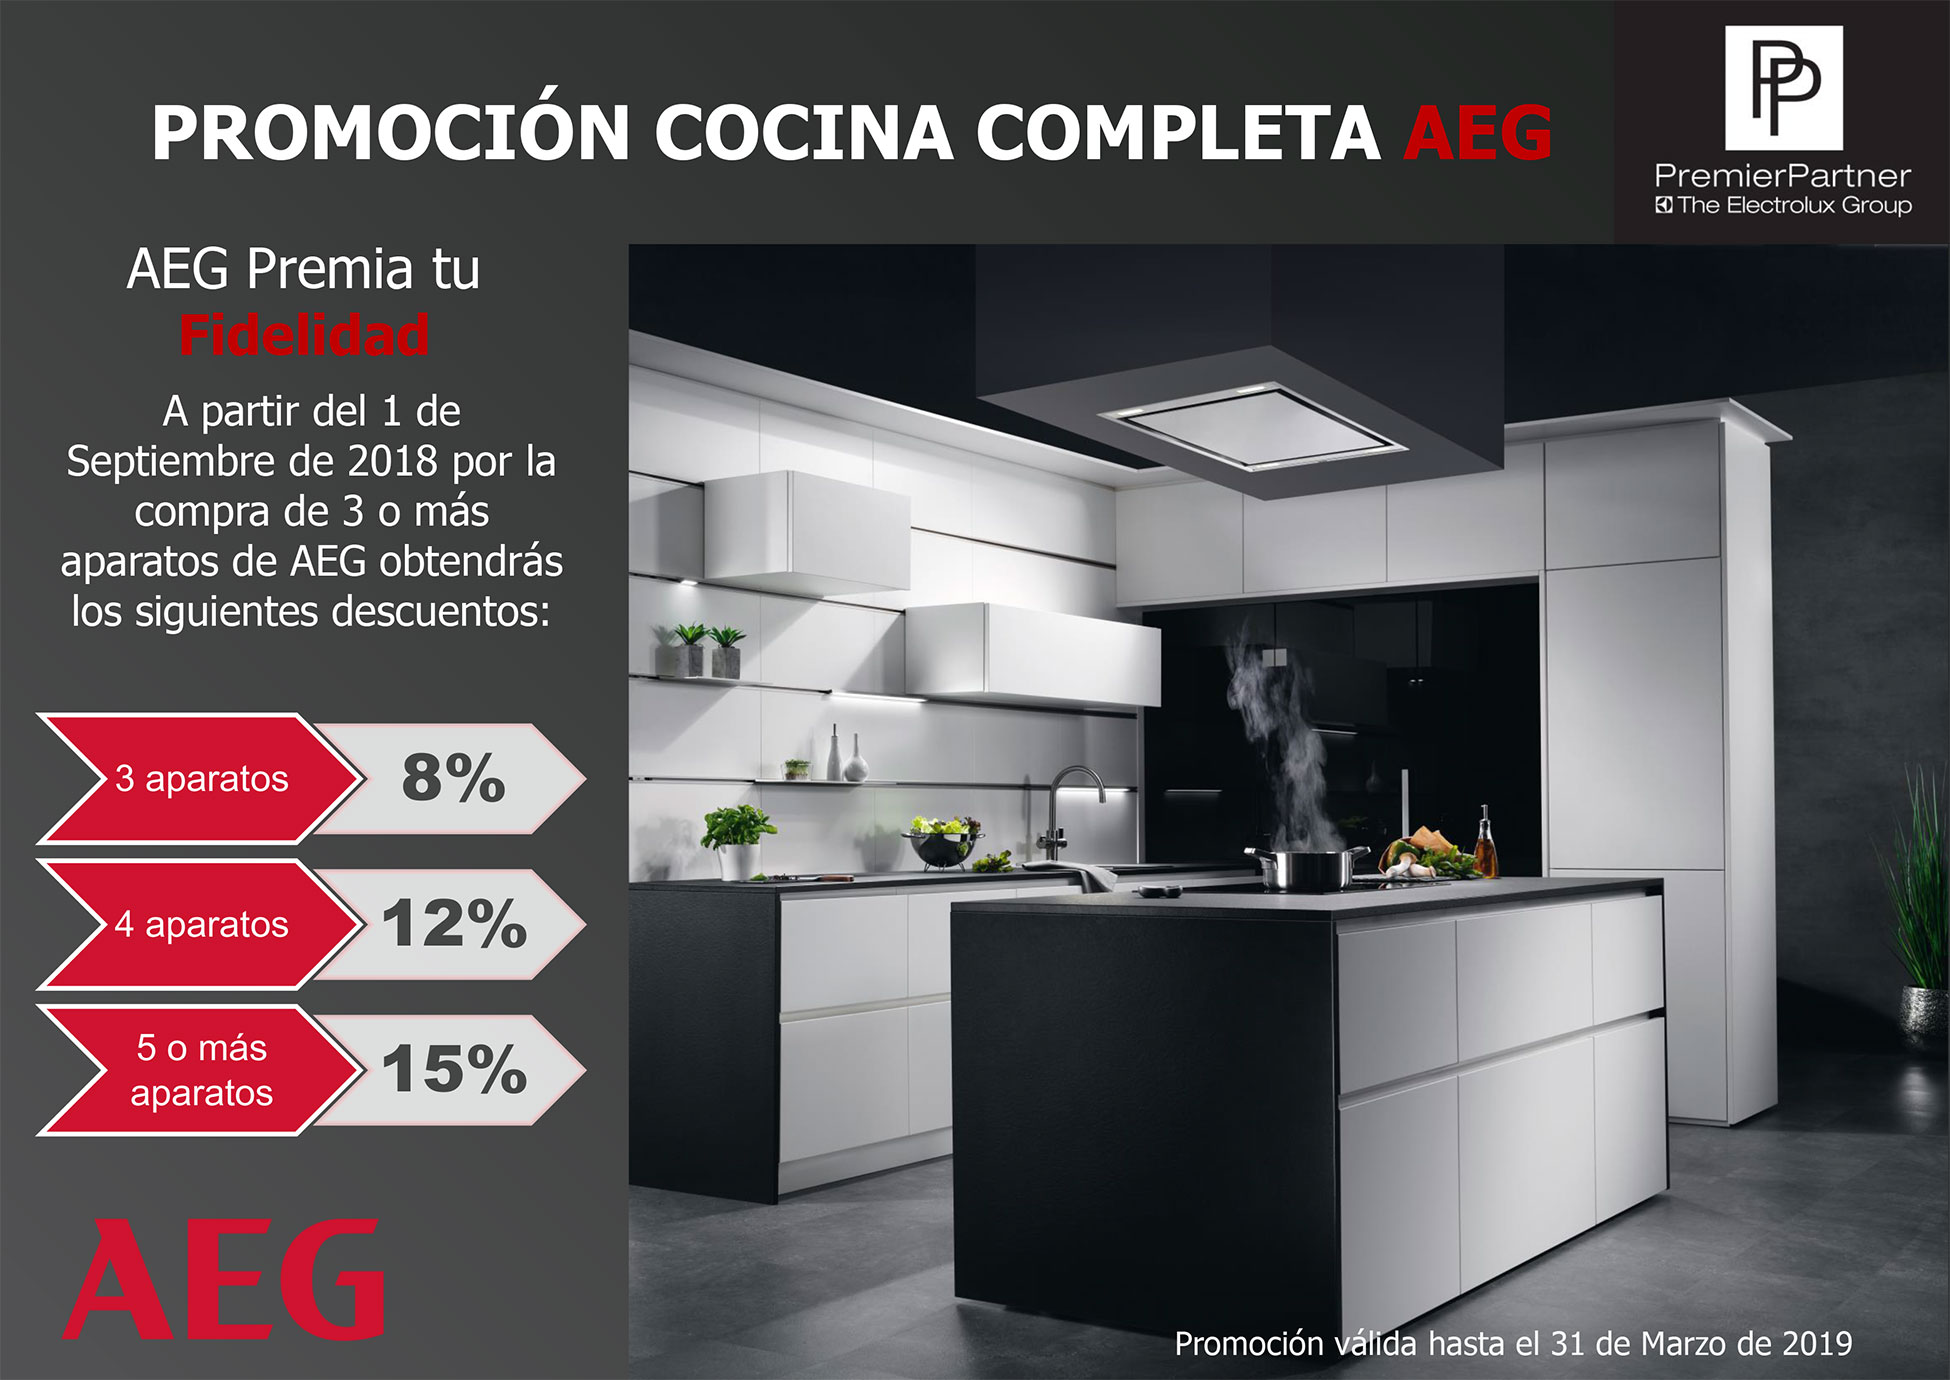 promocion-cocina-completa-premier-partner-aeg